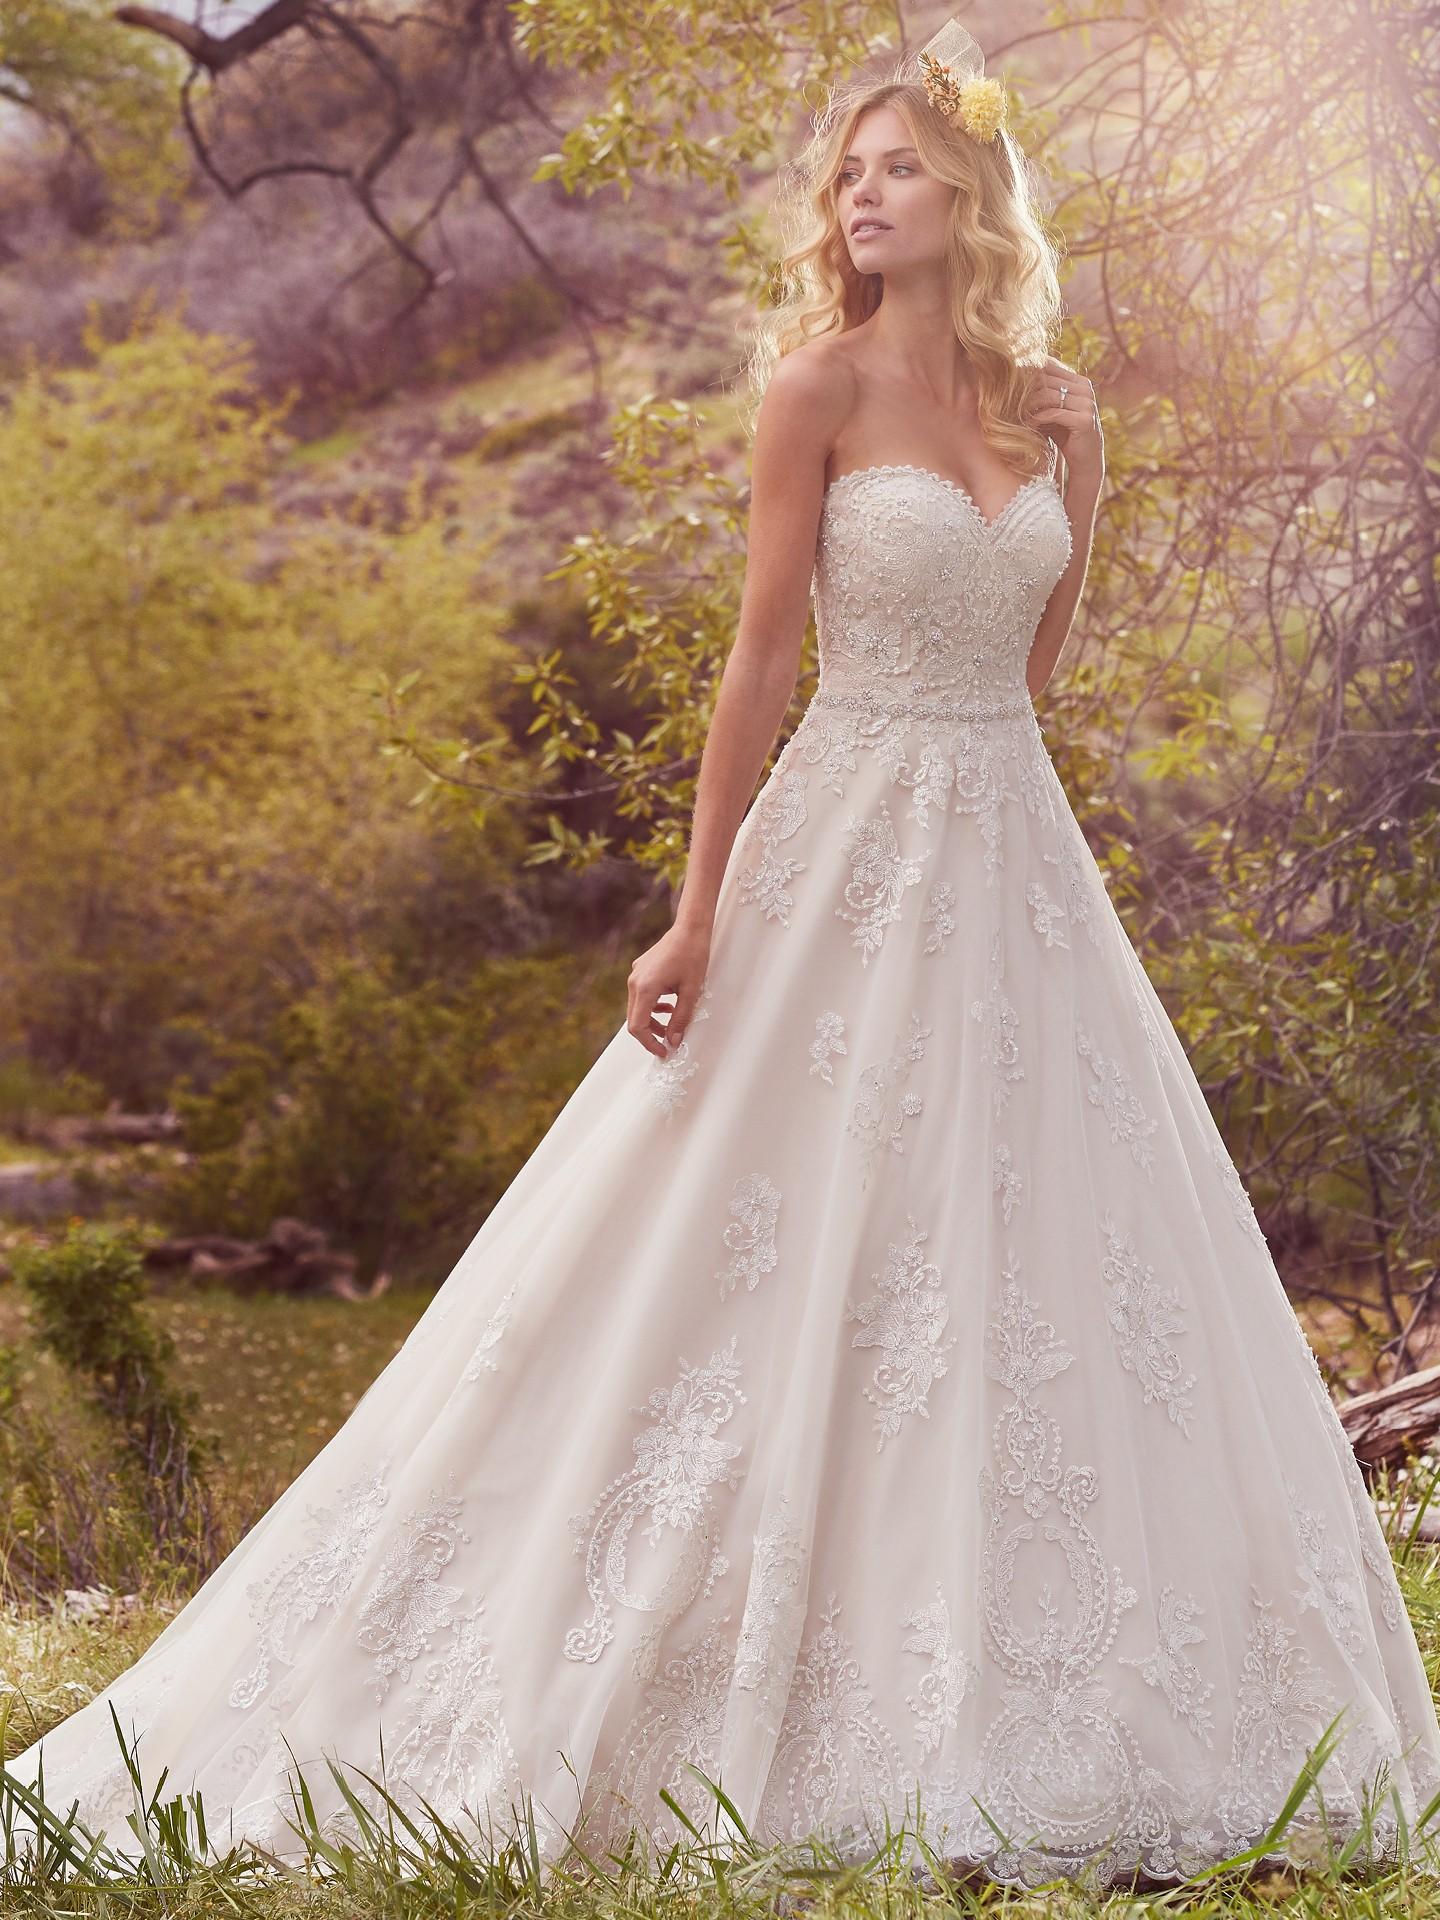 https://ms-cdn.maggiesottero.com/product/Content/Images/73073/High/Maggie-Sottero-Wedding-Dress-Reba-7MS335-Main.jpg